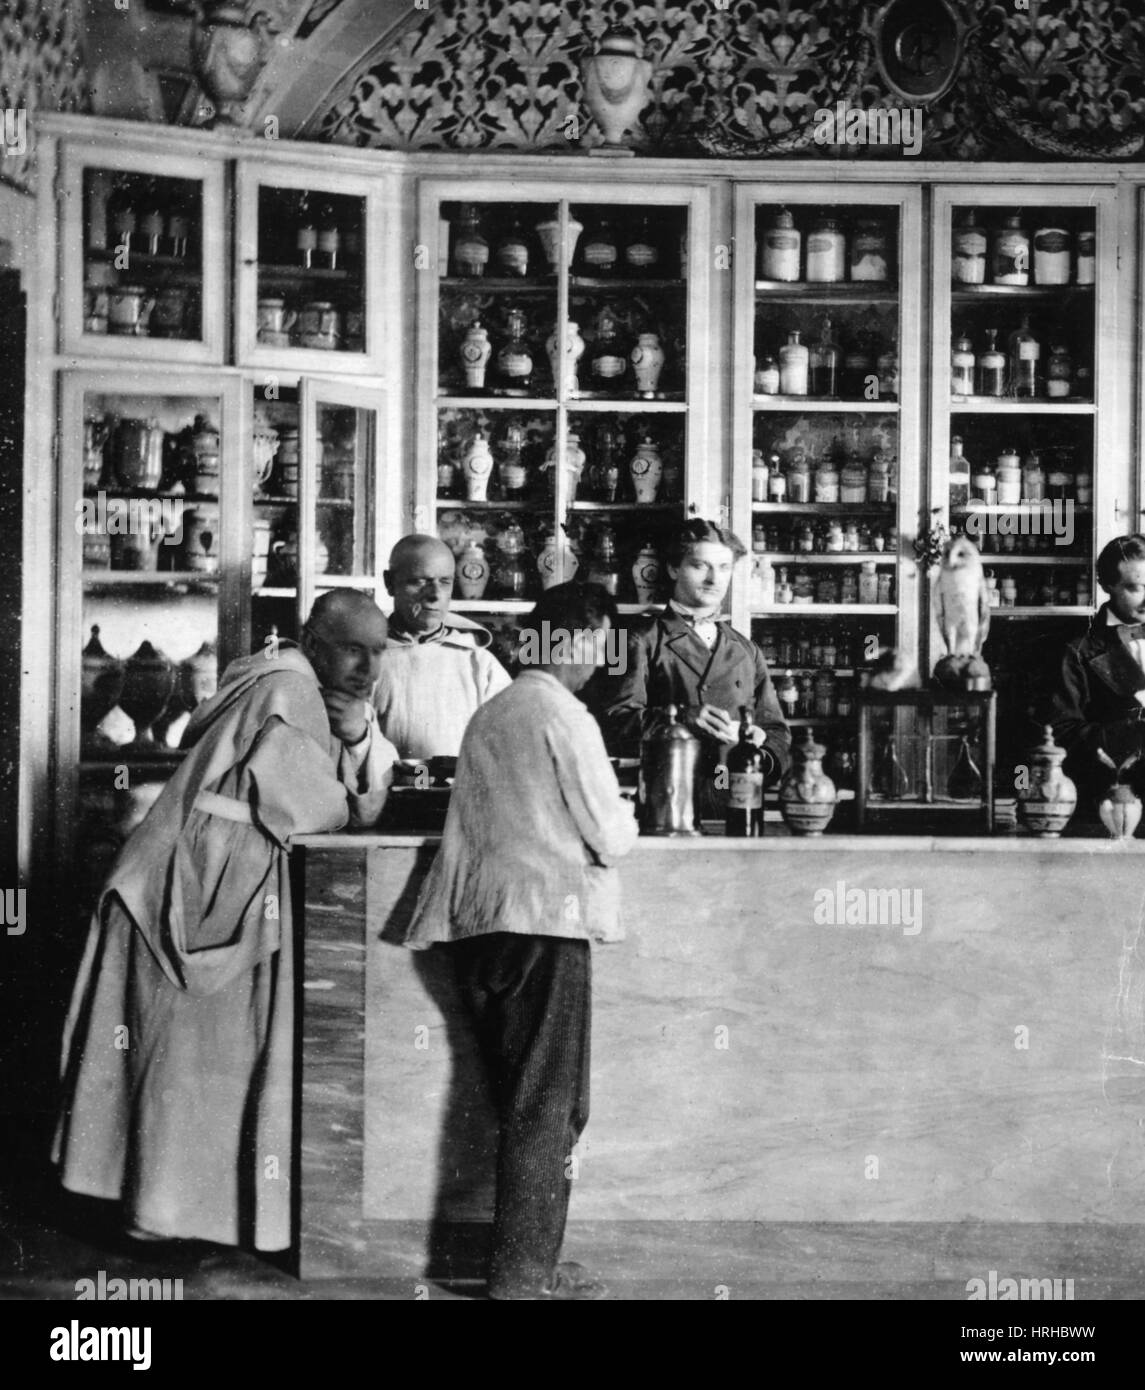 Pharmacy, 1900 - Stock Image